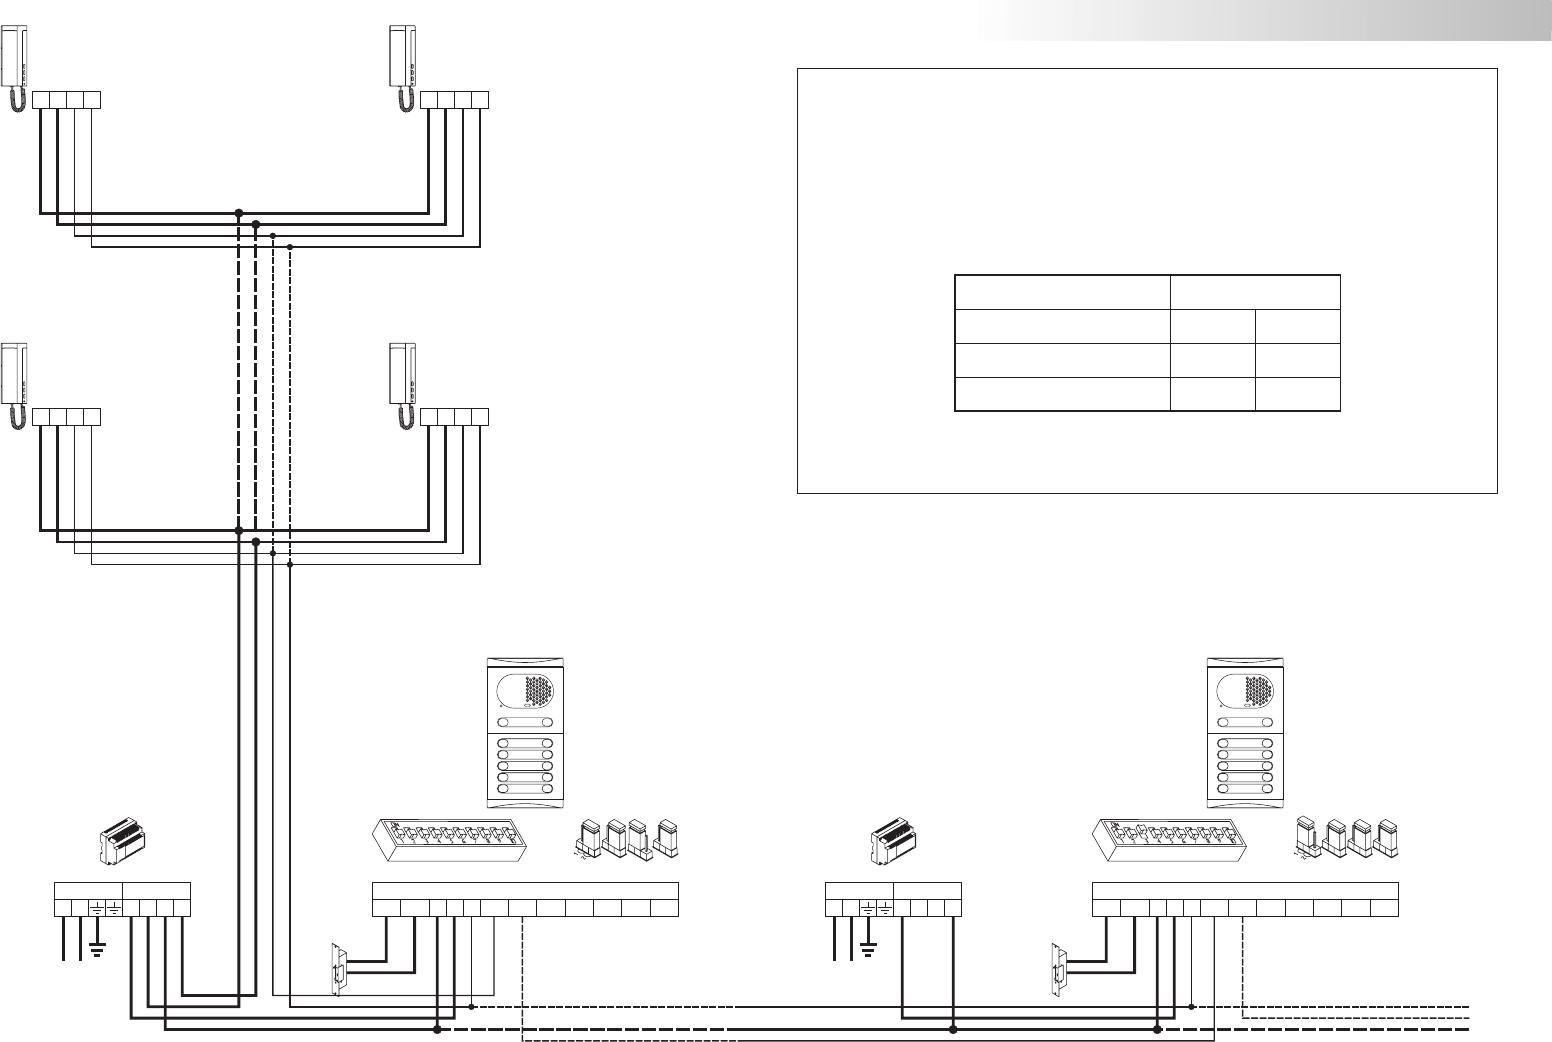 rj31x wiring diagram vauxhall corsa timing chain phone line seizure box layout elsavadorla